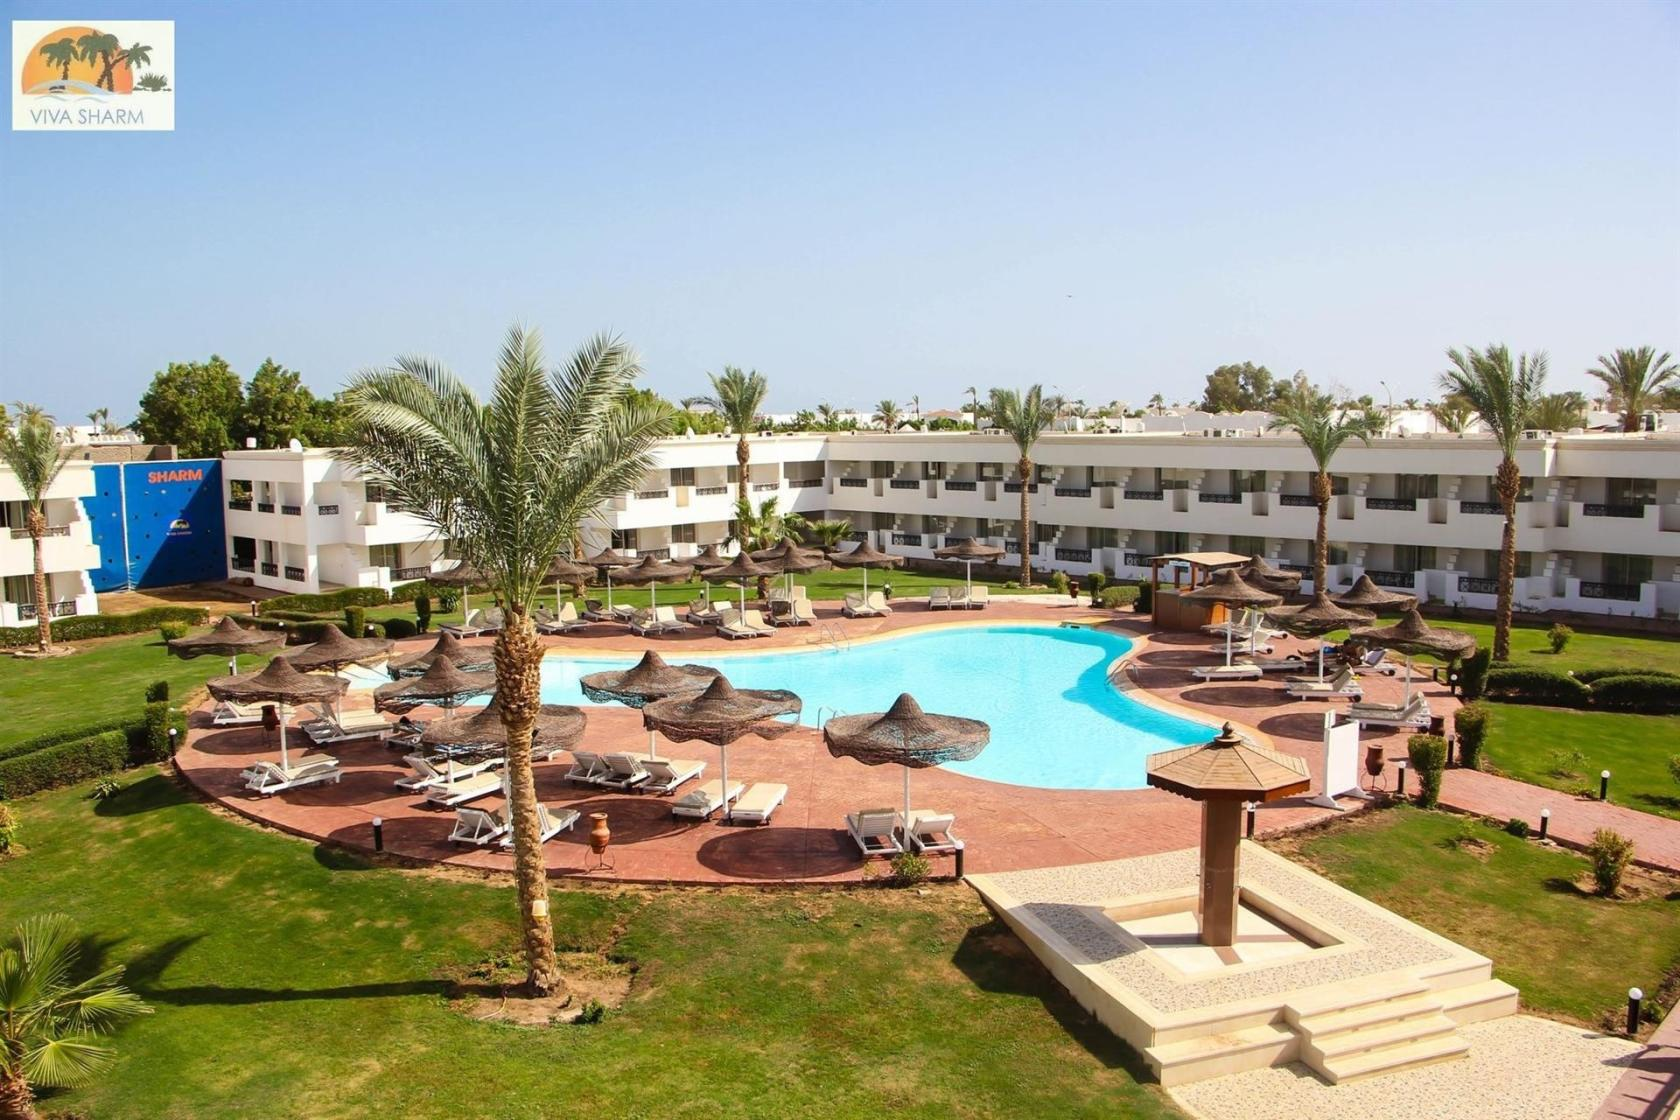 VIVA SHARM HOTEL 3 *